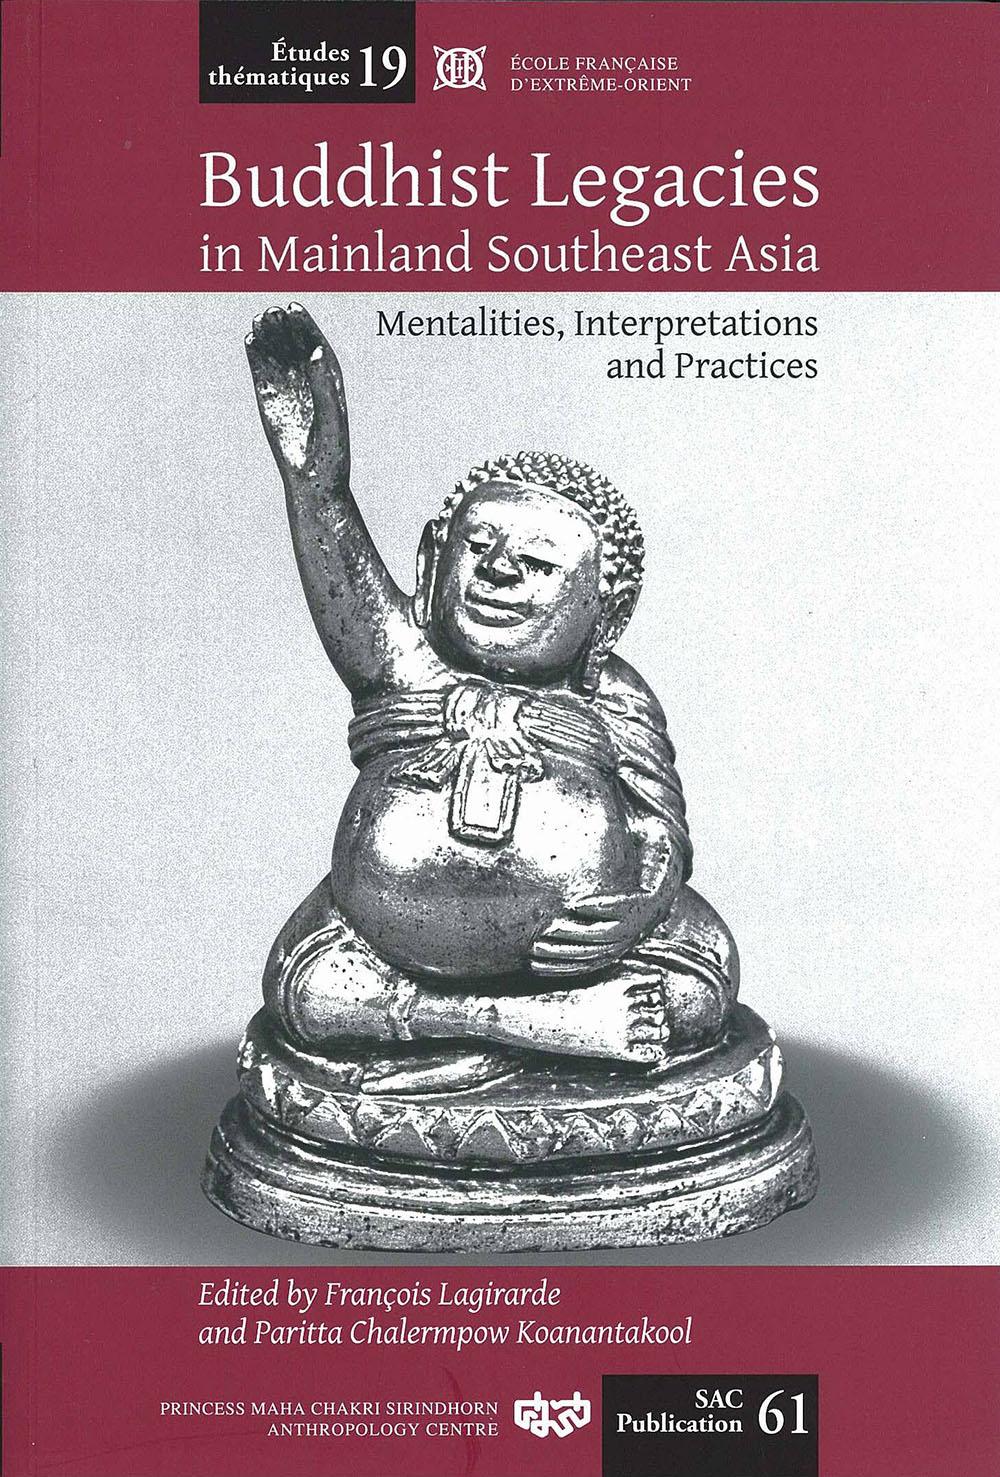 Buddhist Legacies in Mainland Southeast Asia